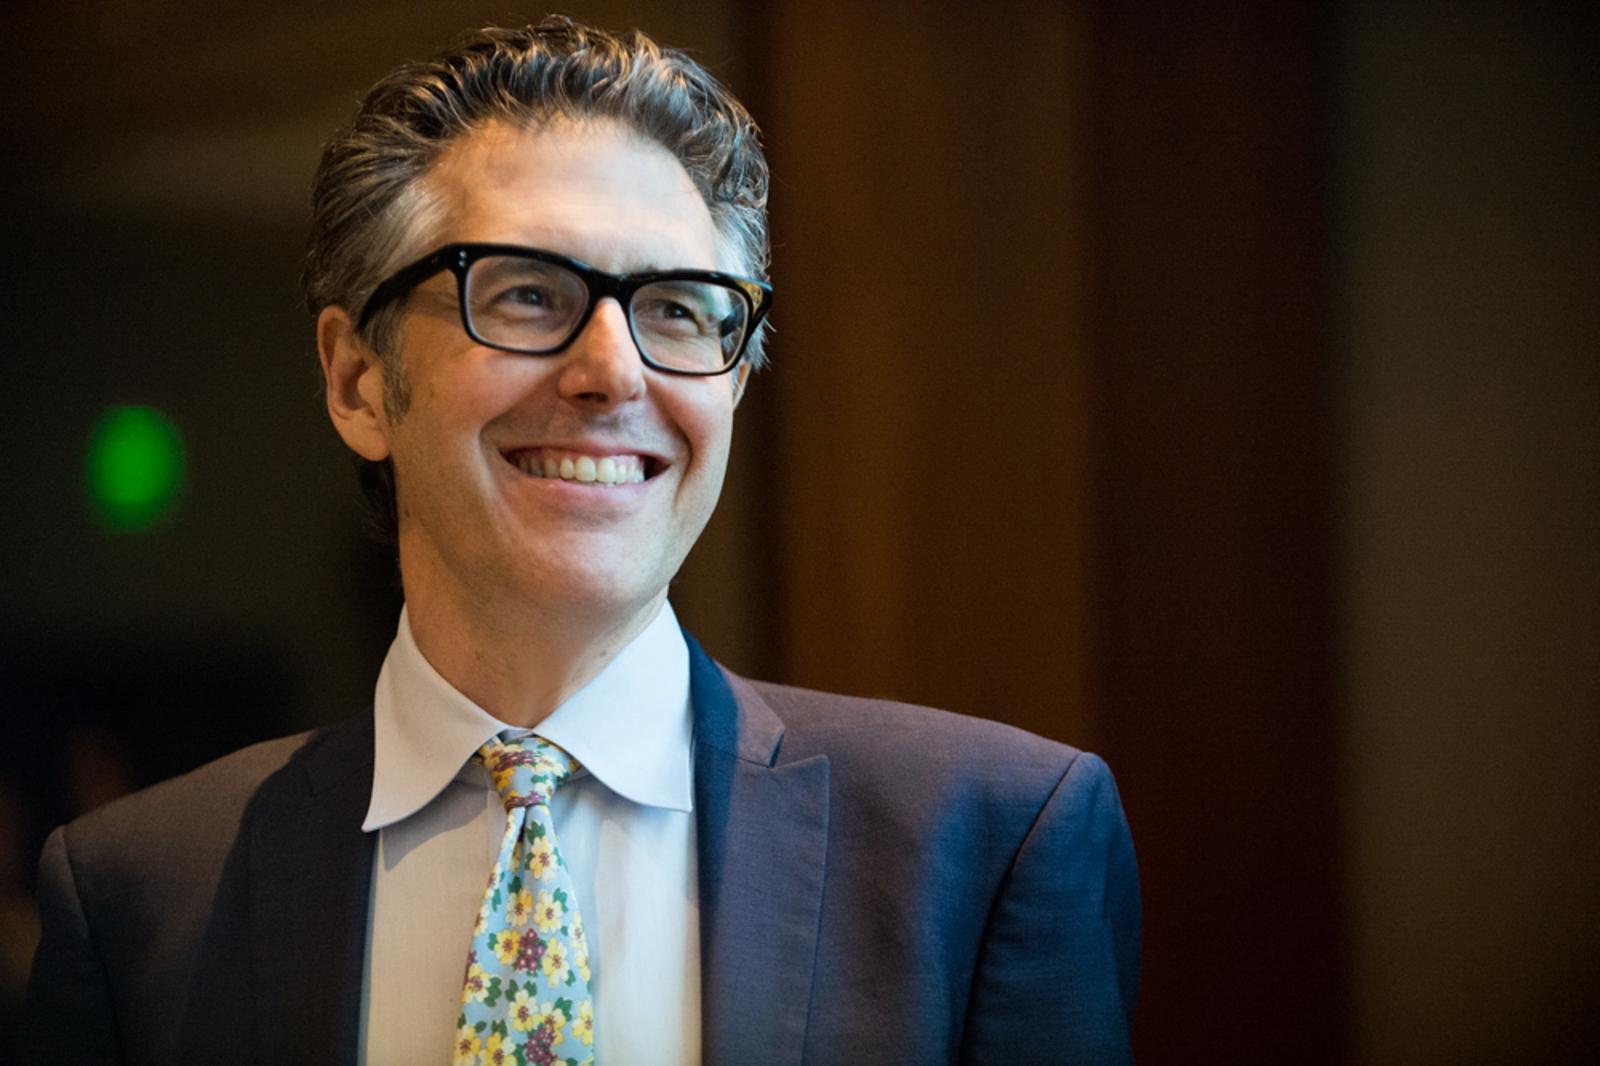 Portrait of radio host Ira Glass smiling, looking away